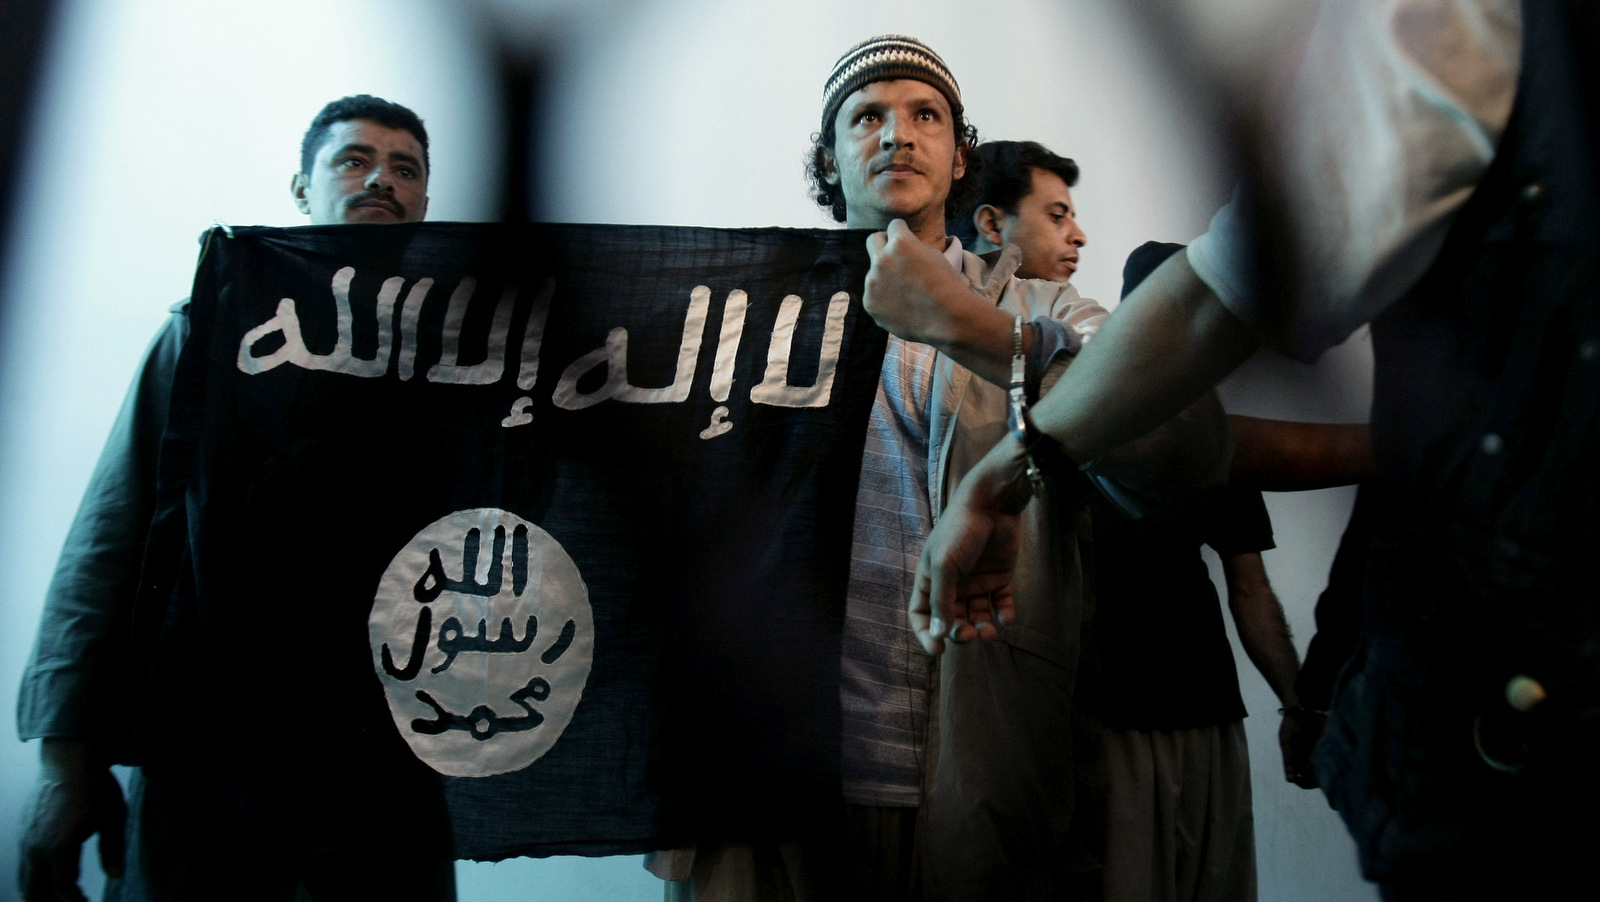 Global Watchdog Takes Saudi Arabia to Task over Terrorism Financing